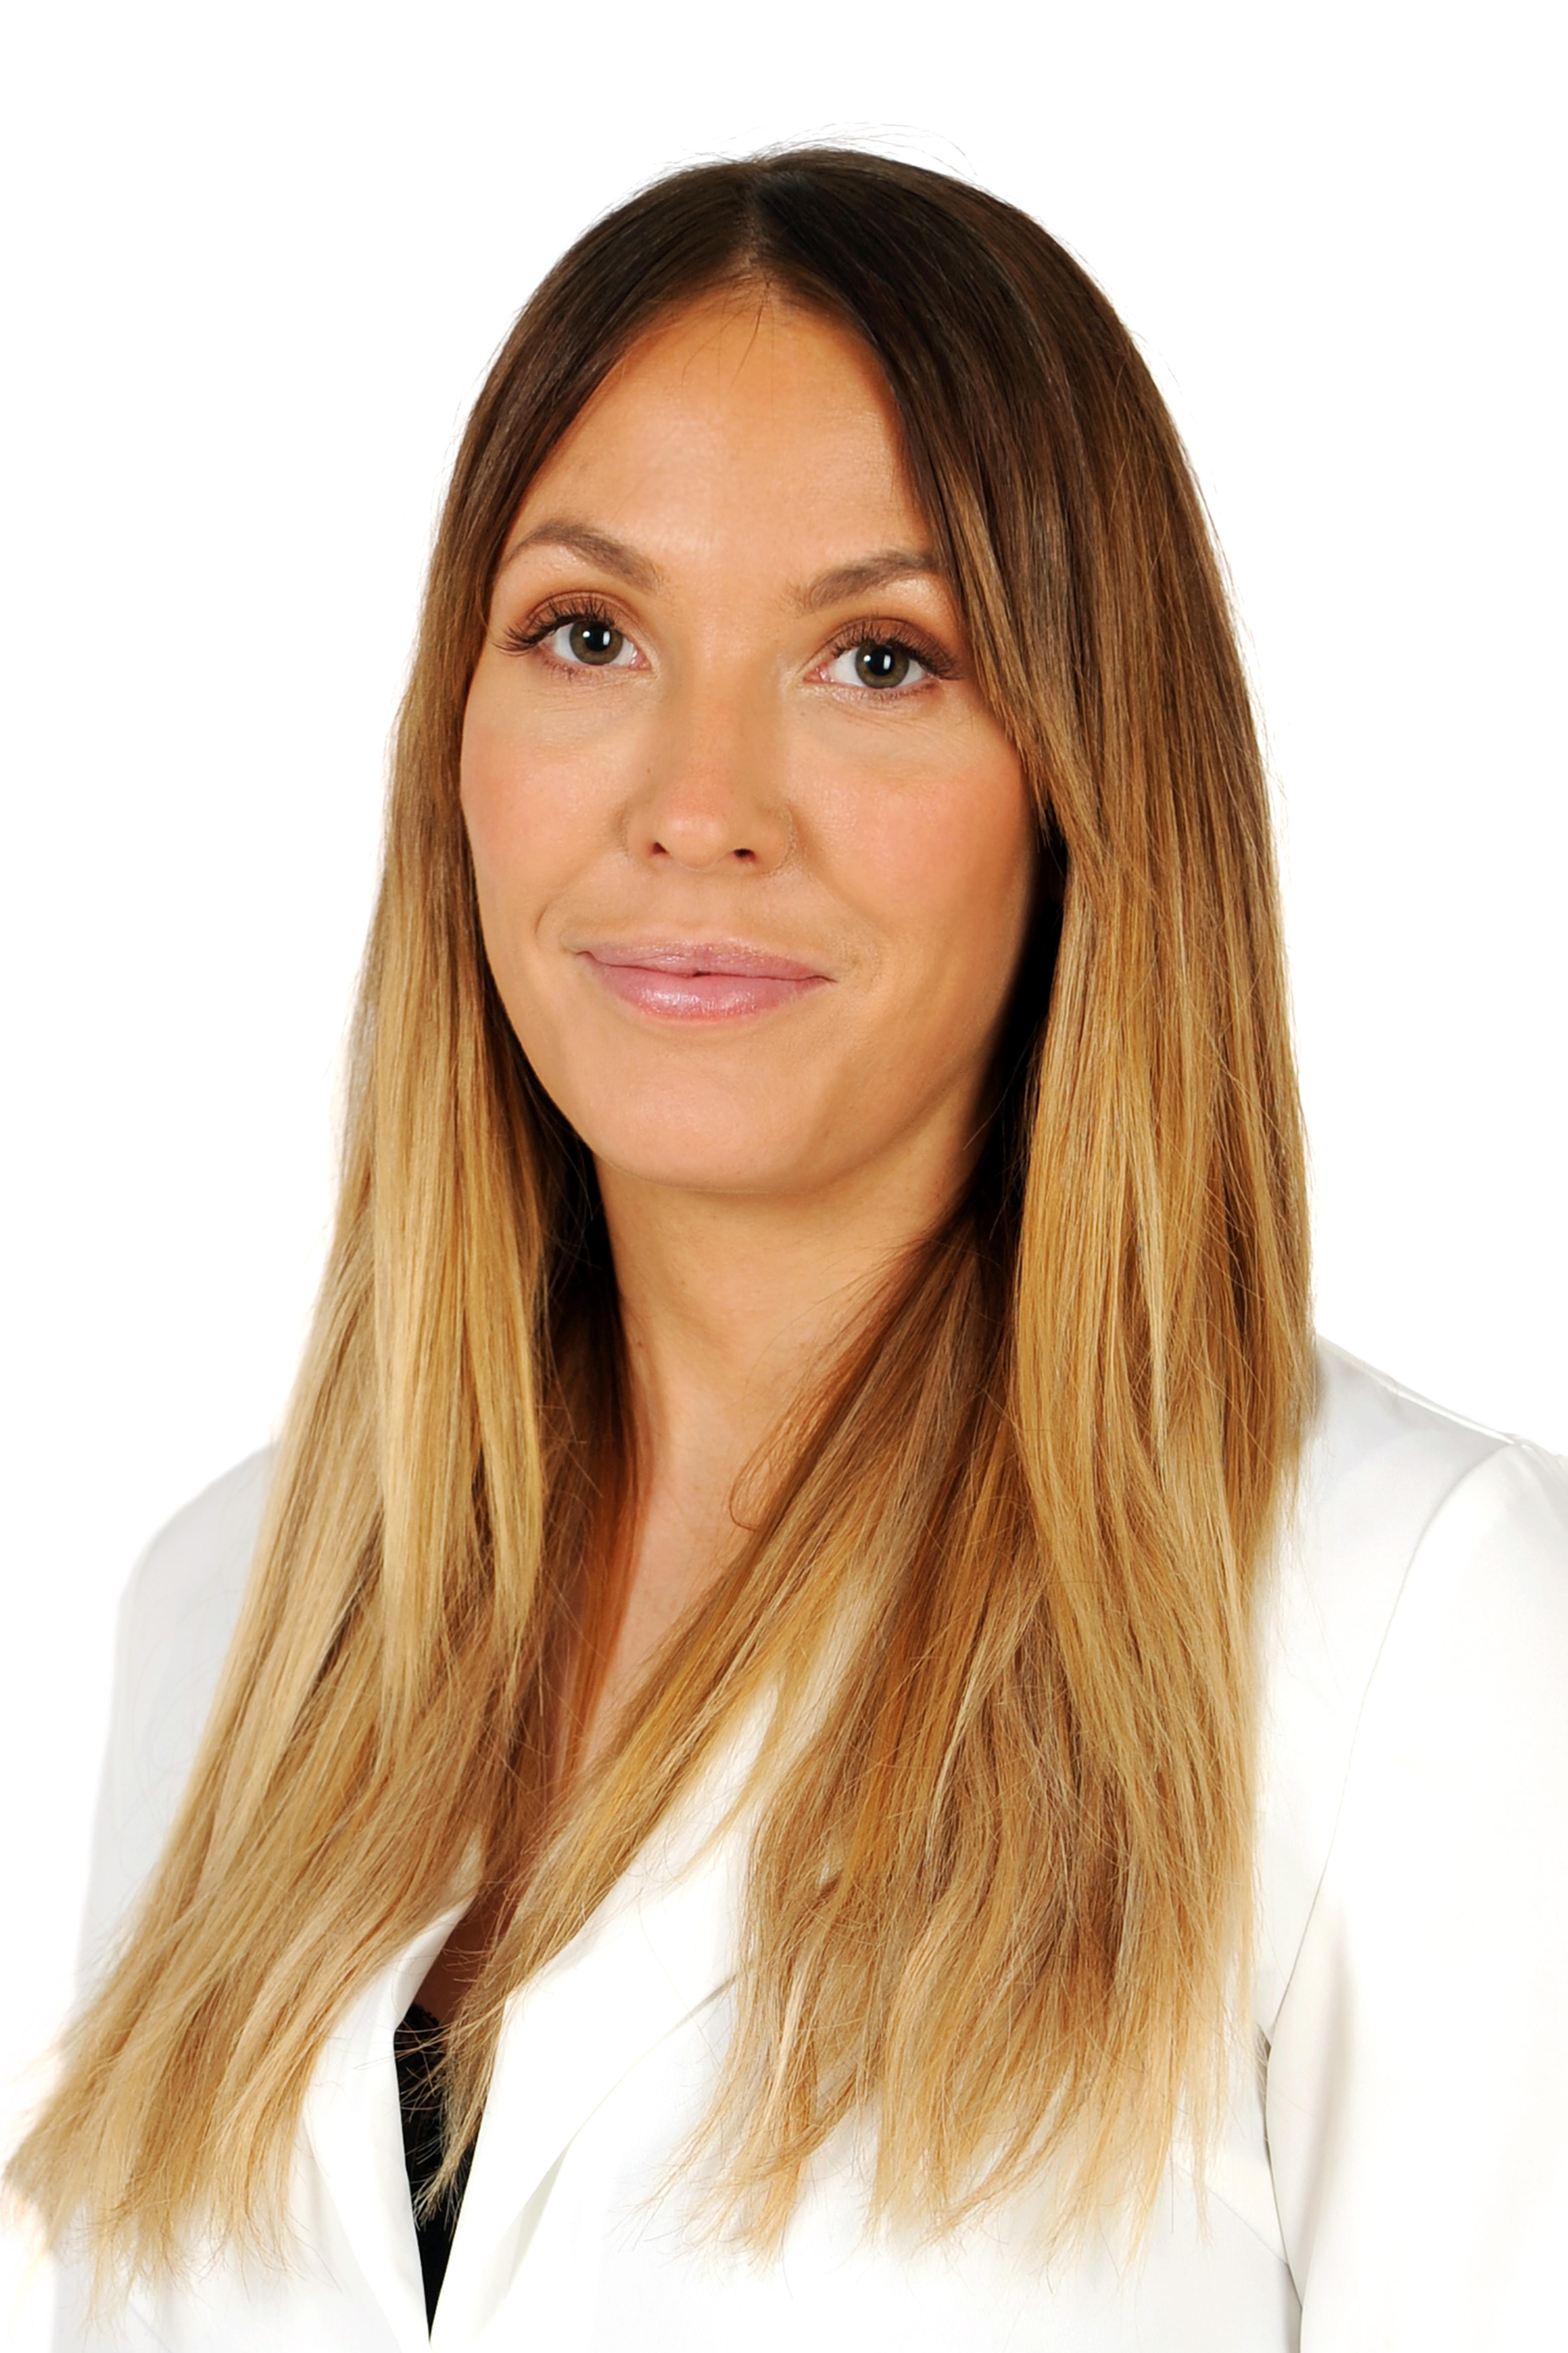 Angelica Kandalina